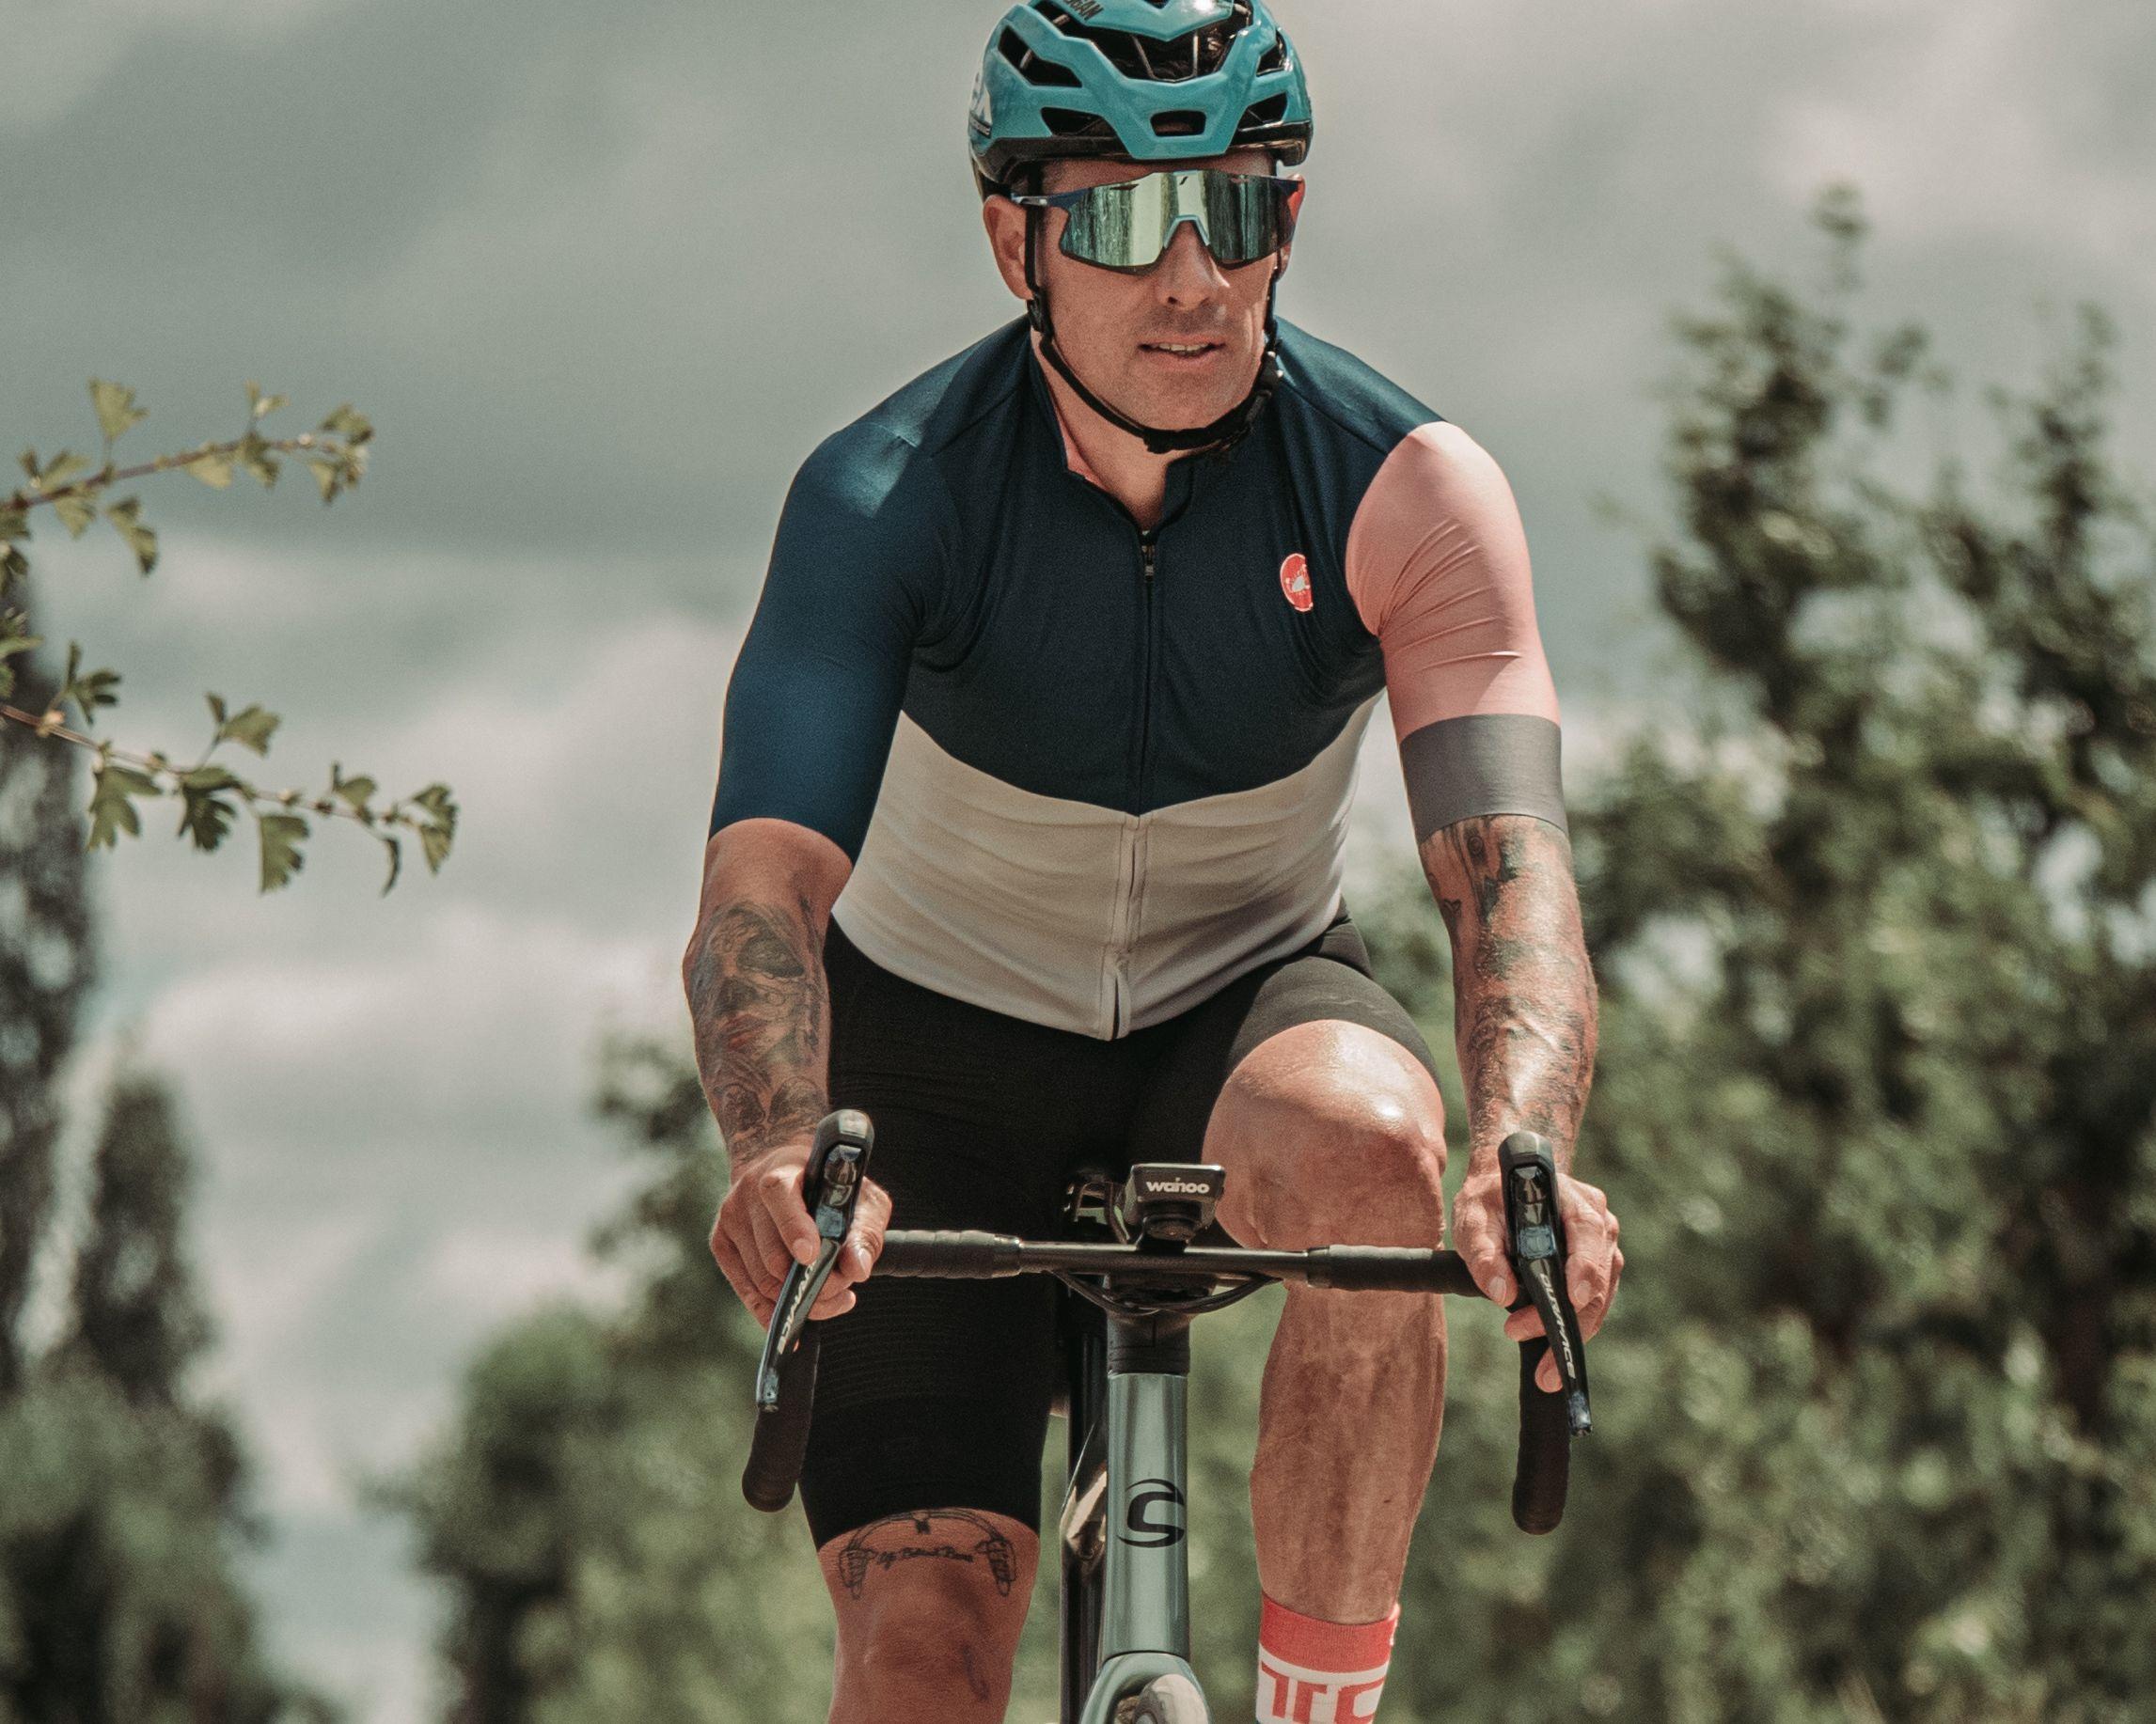 Castelli fietsshirt Limited Edition